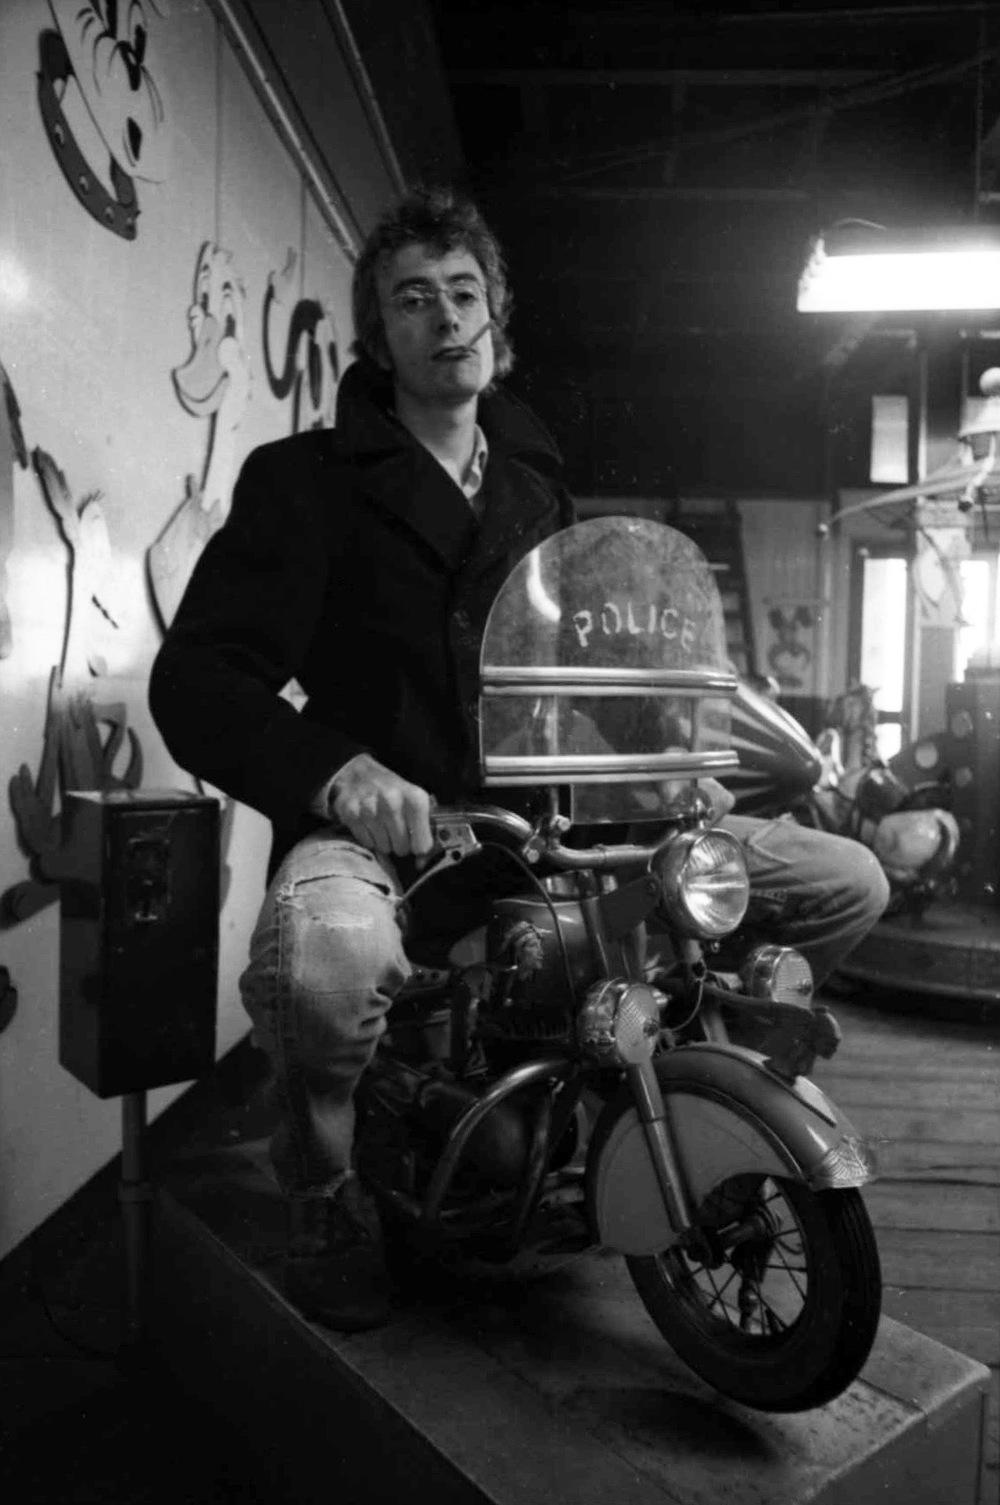 anthony baker, london, mid-1970's